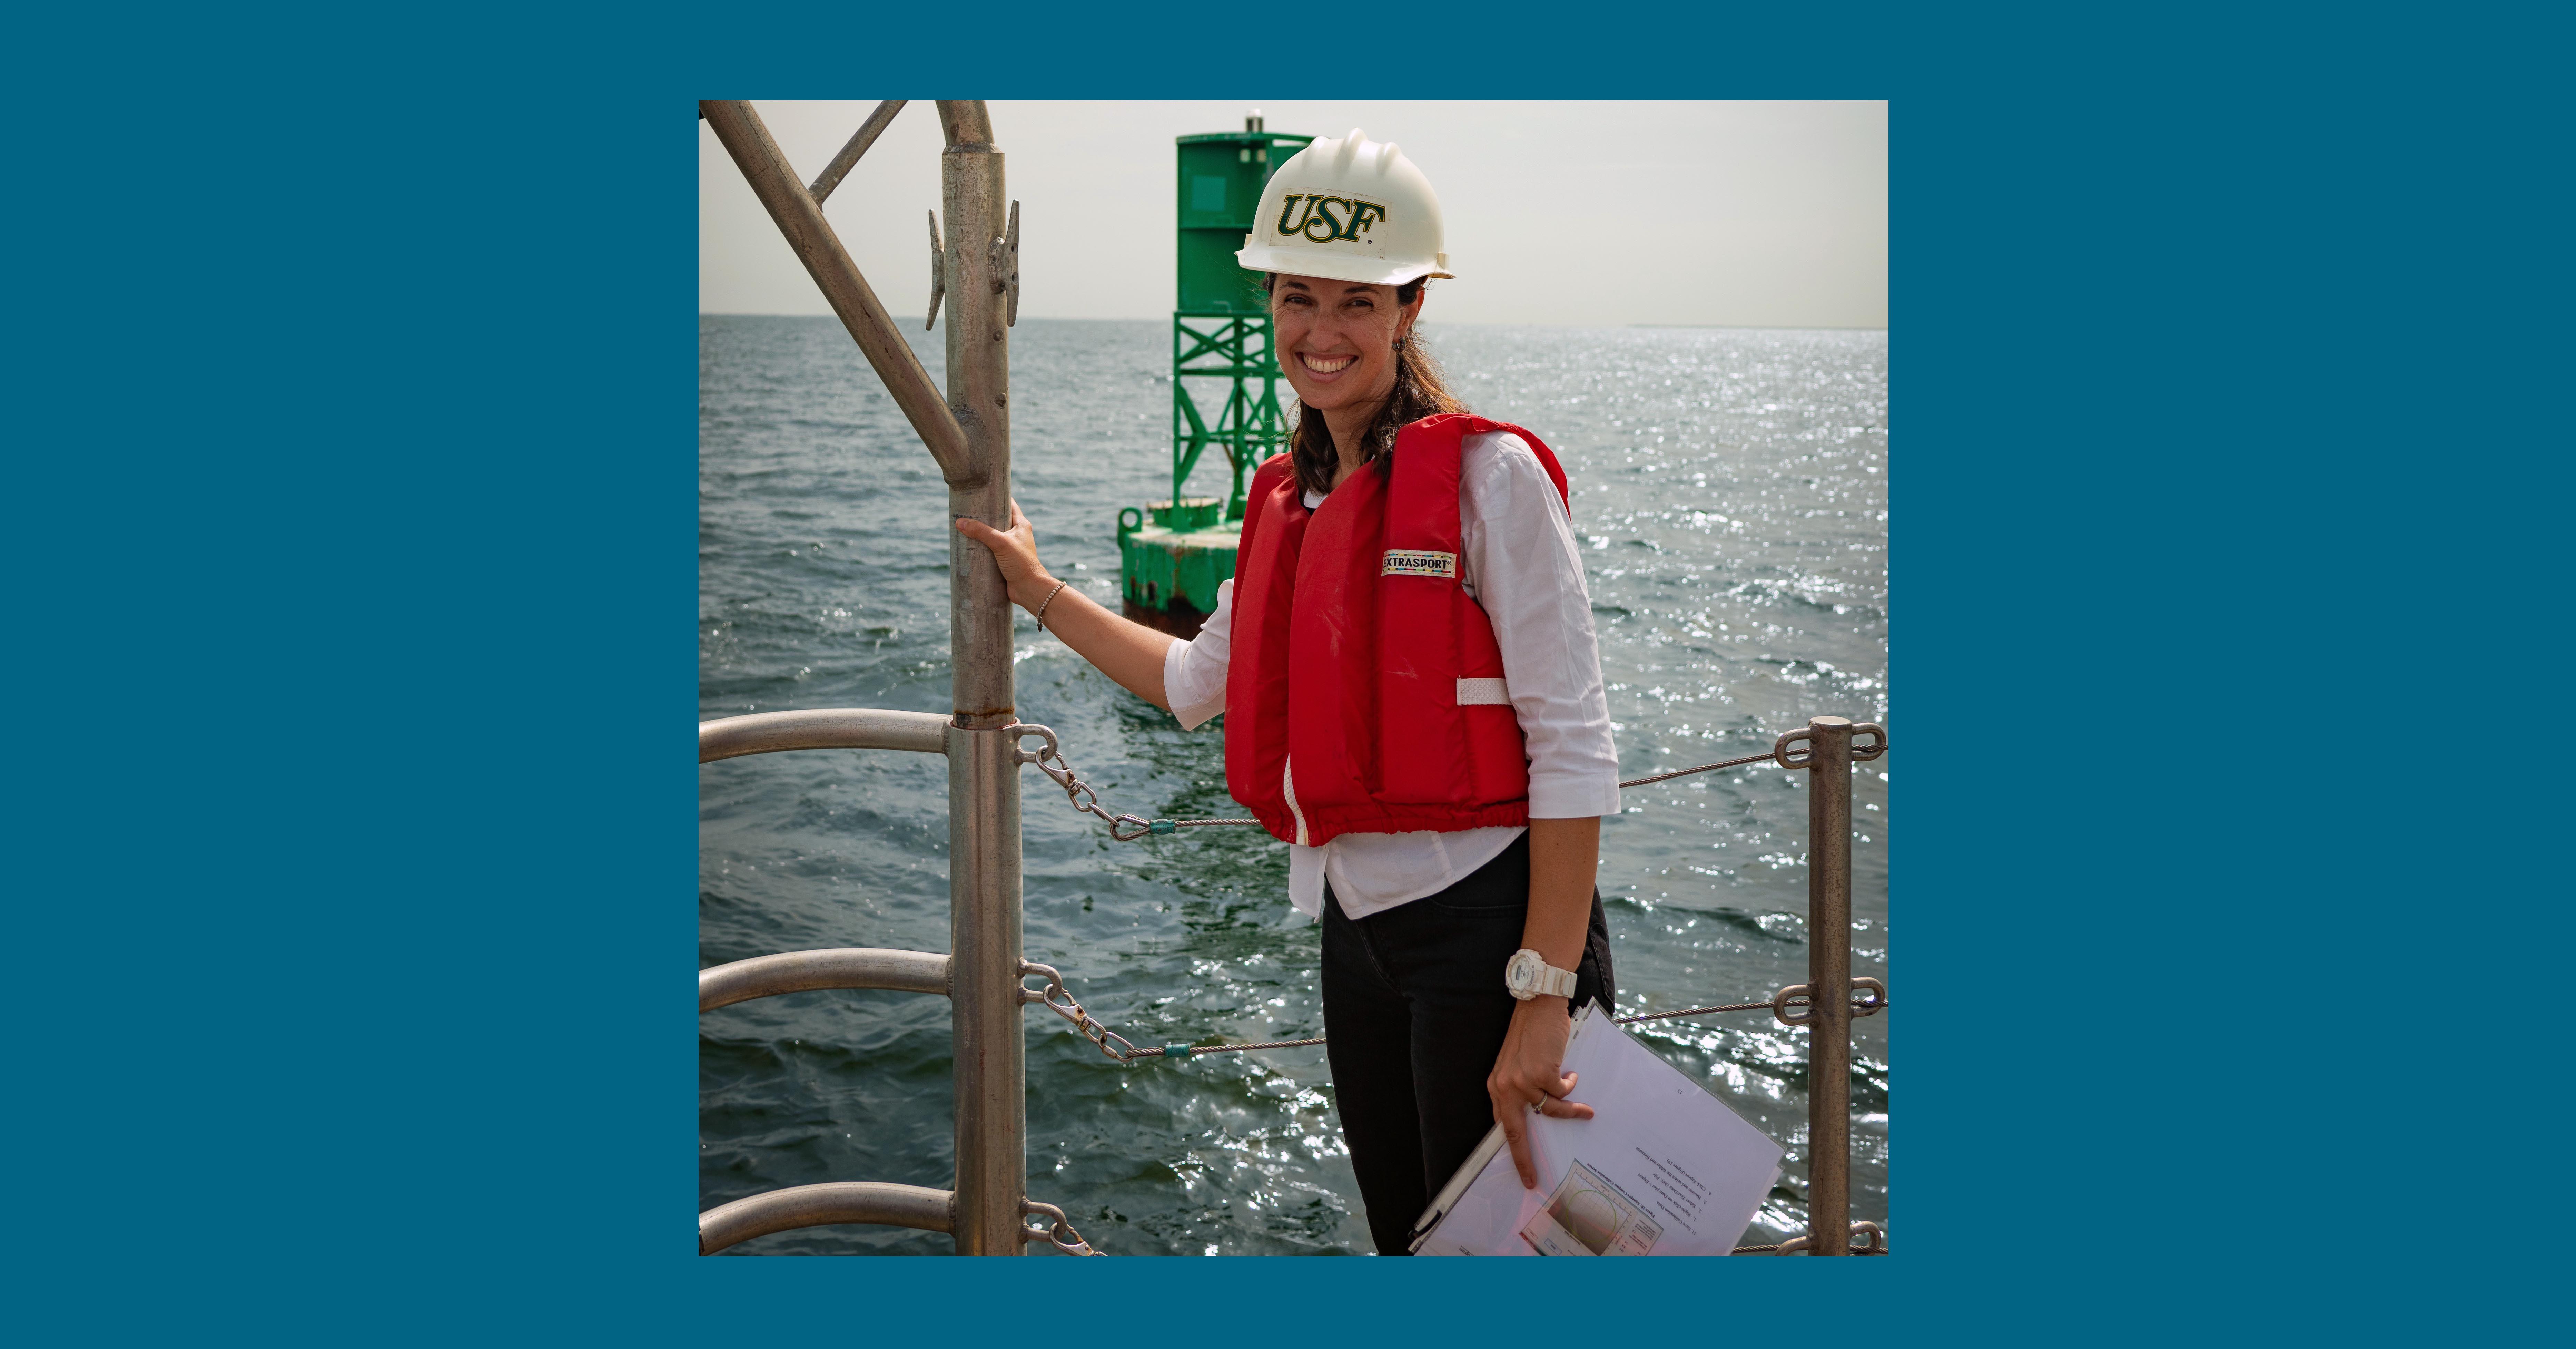 Laura Azevedo - USF CMS graduate student